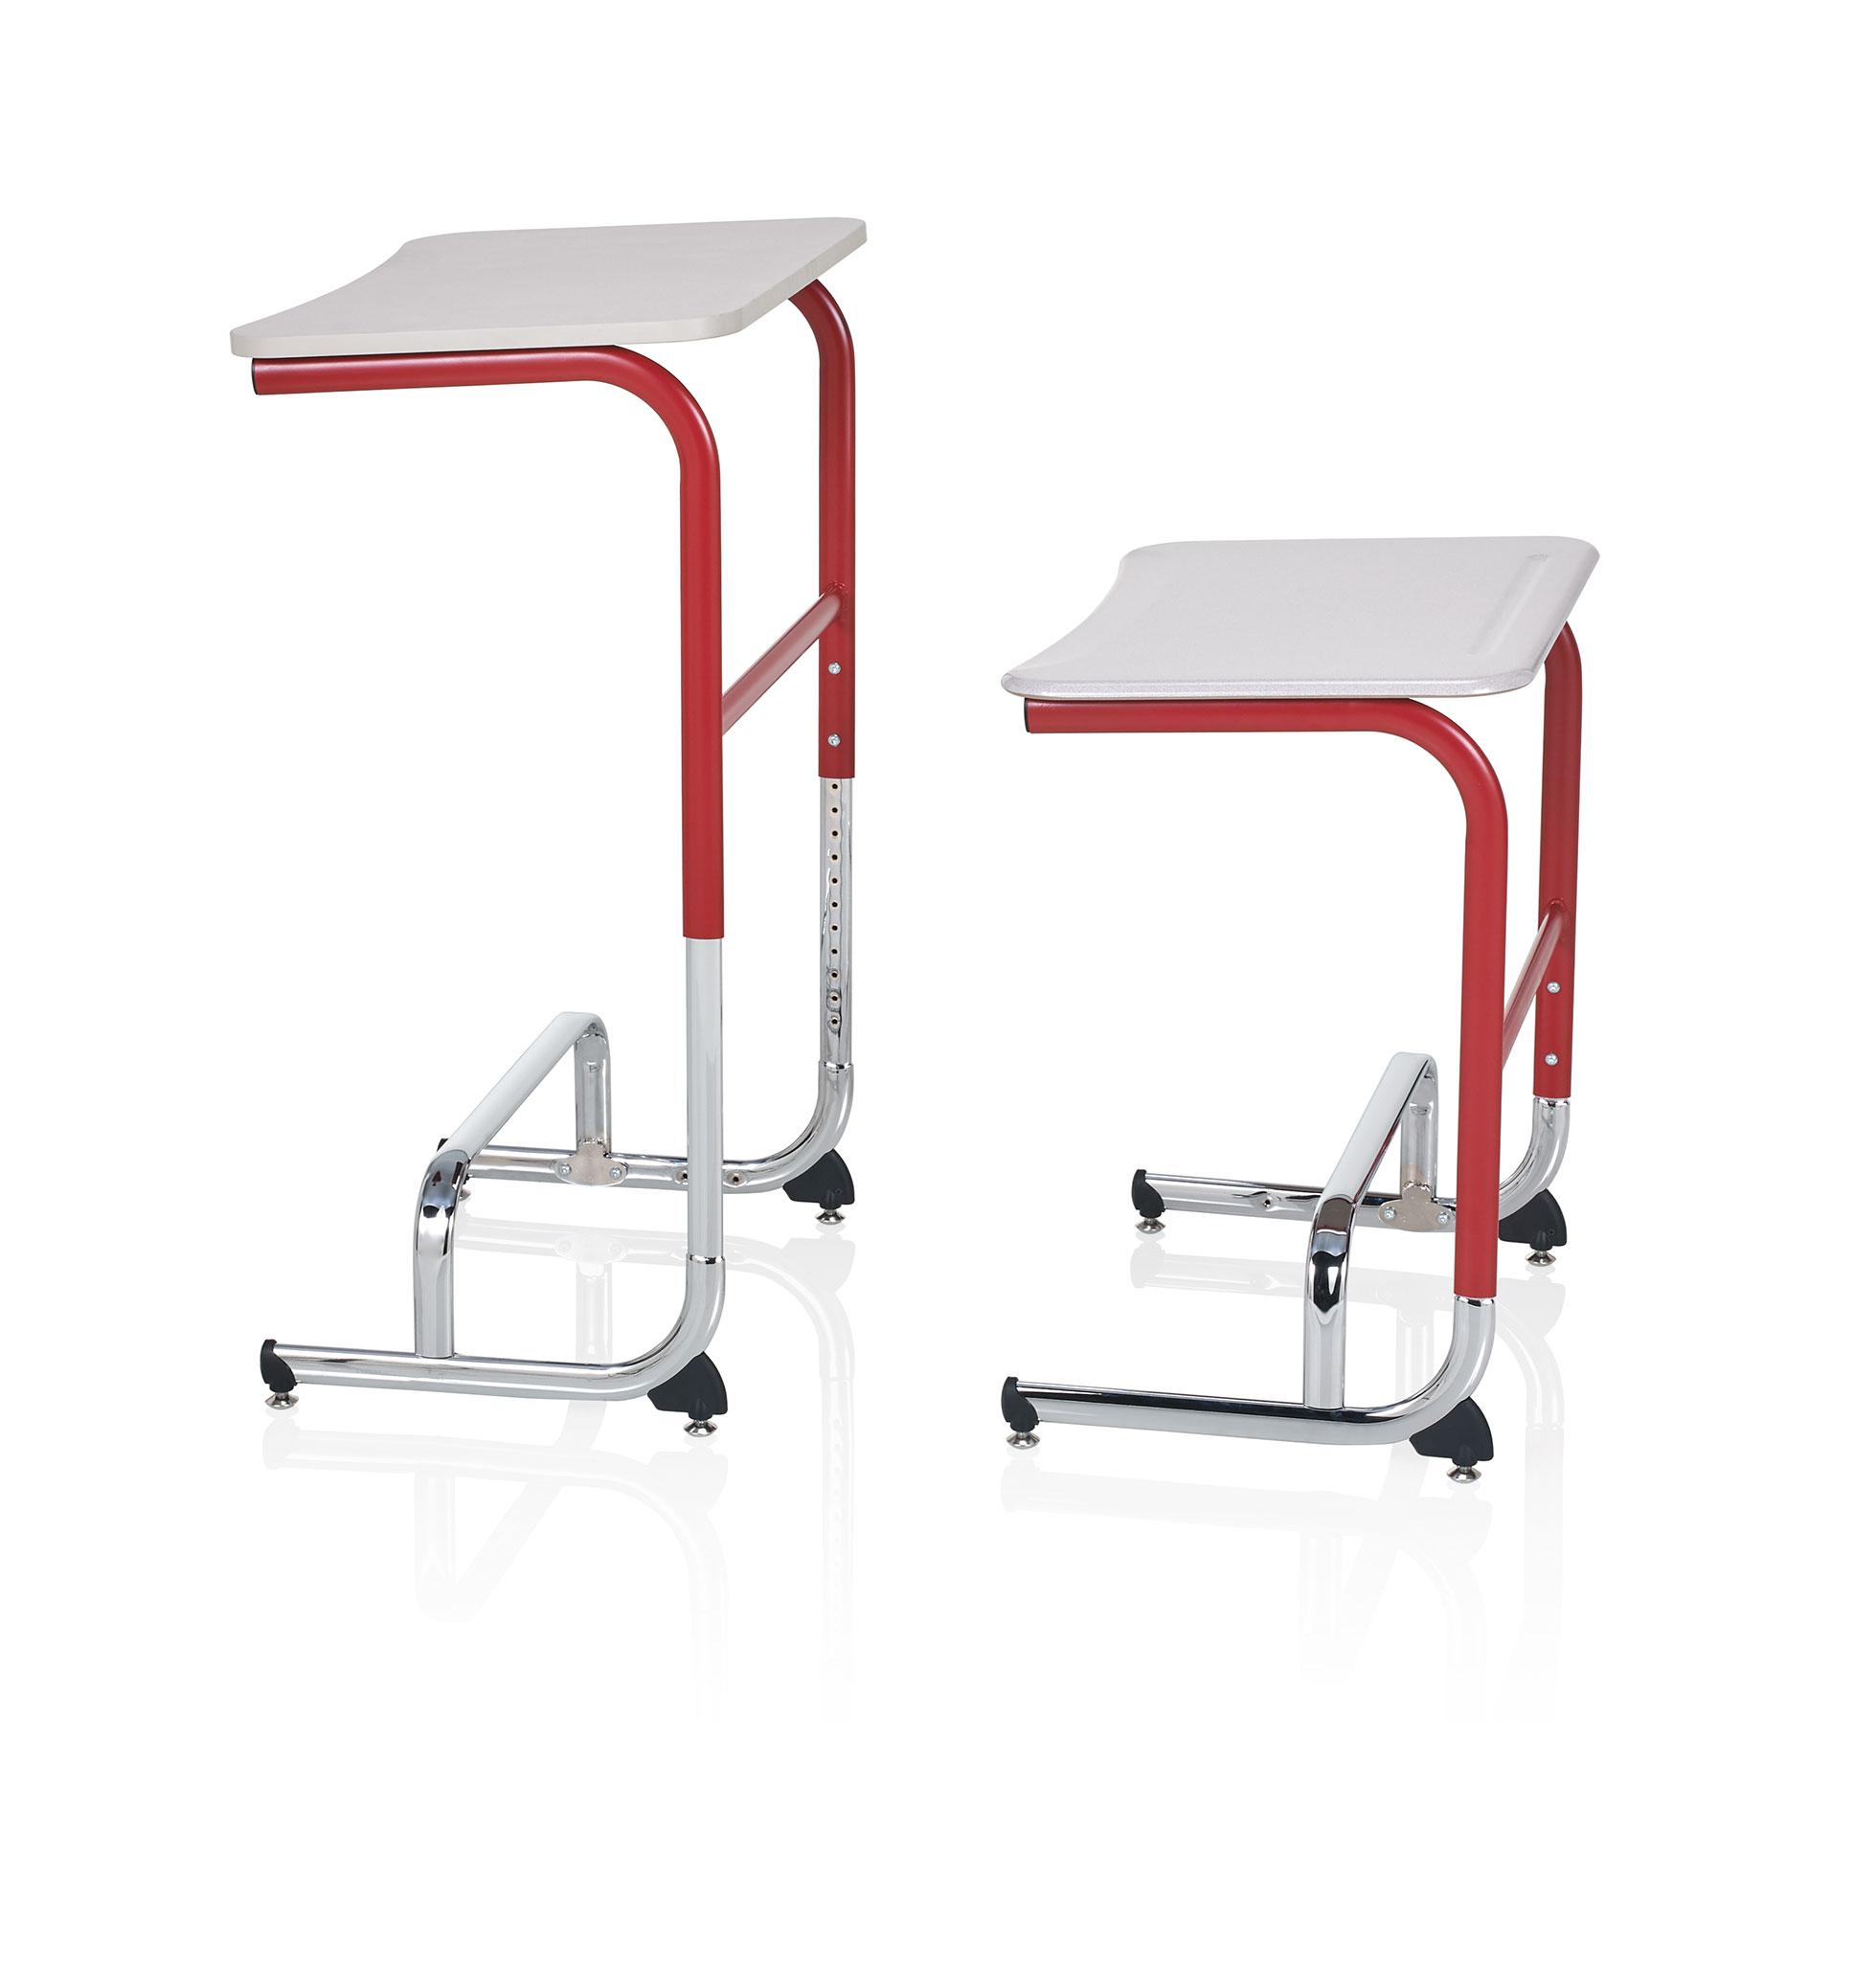 Wave_desk_sitstand_high_low_profile.jpg